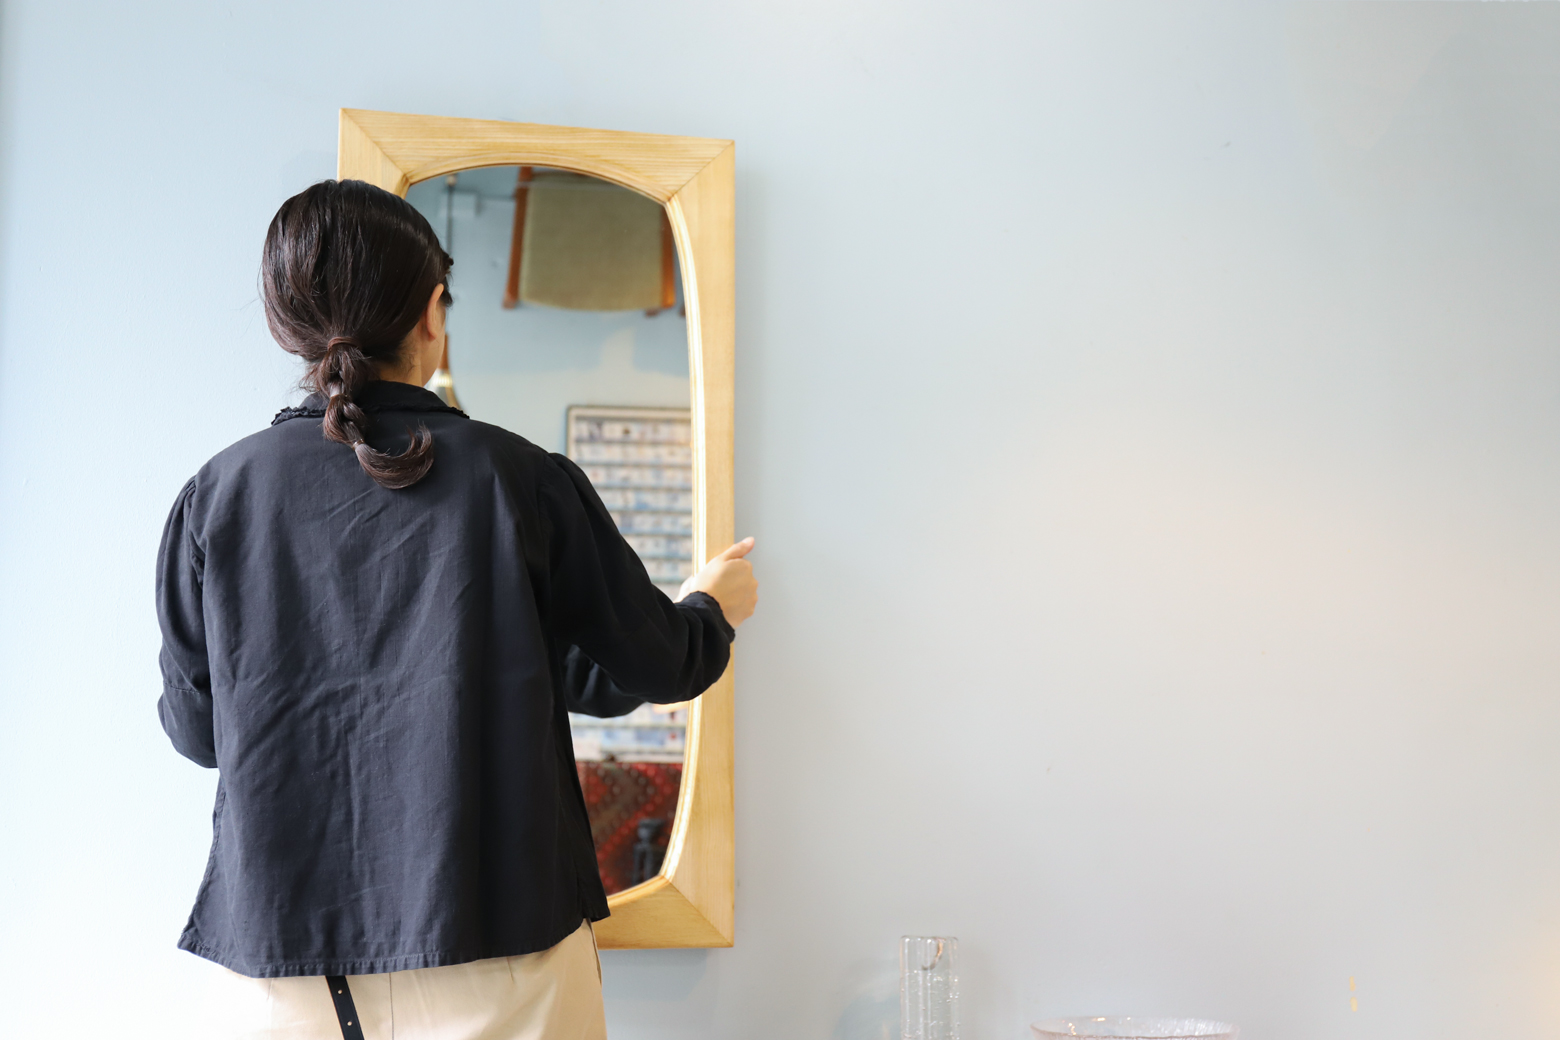 Oak Wood Frame Wall Mirror/オーク材 ウォールミラー 壁掛け 鏡 ナチュラルインテリア